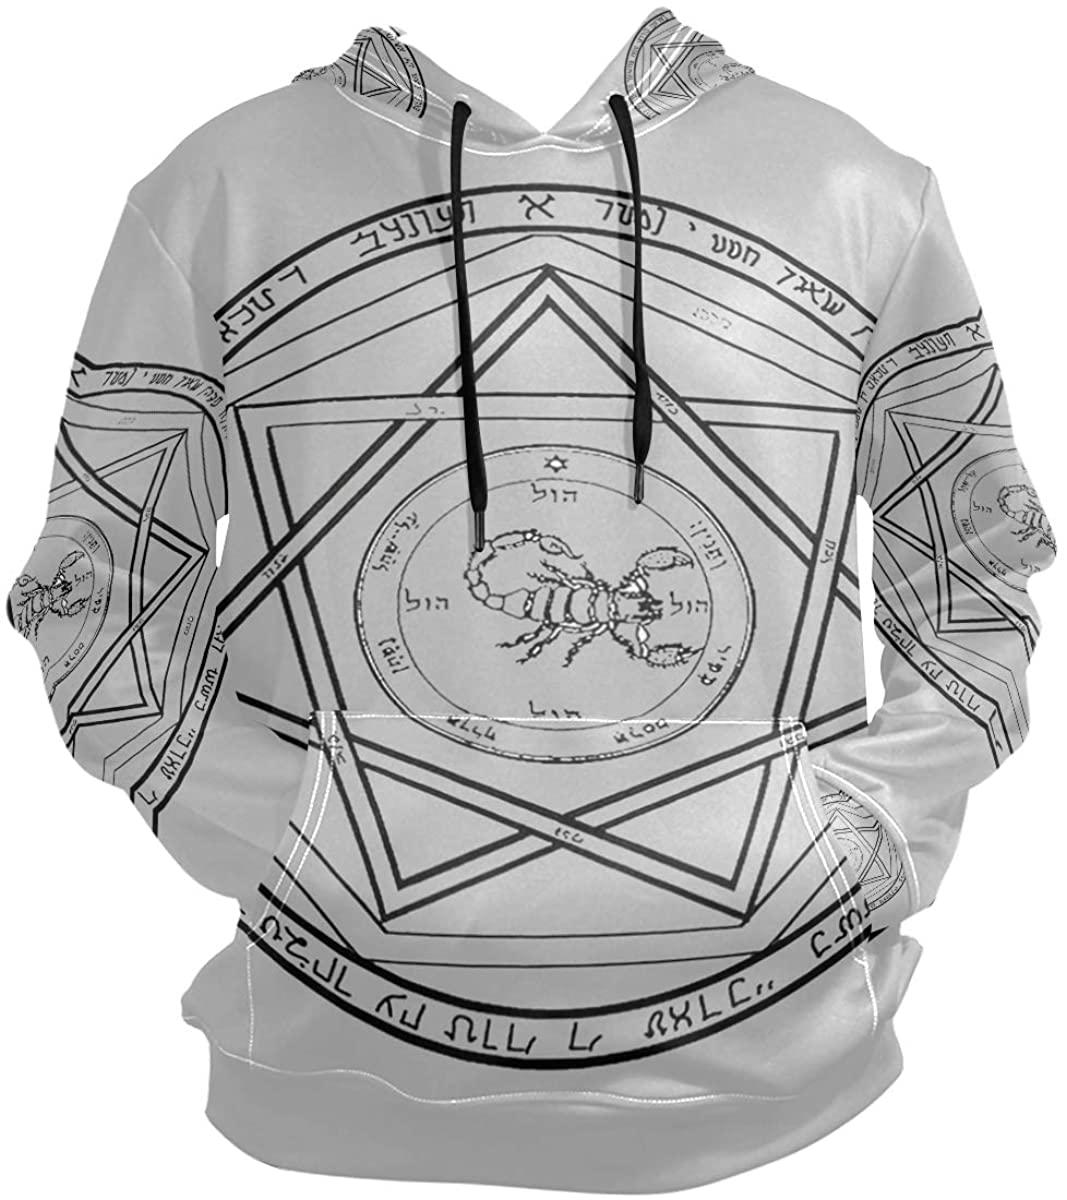 SLHFPX 3D Hoodie Supernatural Demon Devil's Pullover Hooded Sweatshirts Long Sleeve Shirt